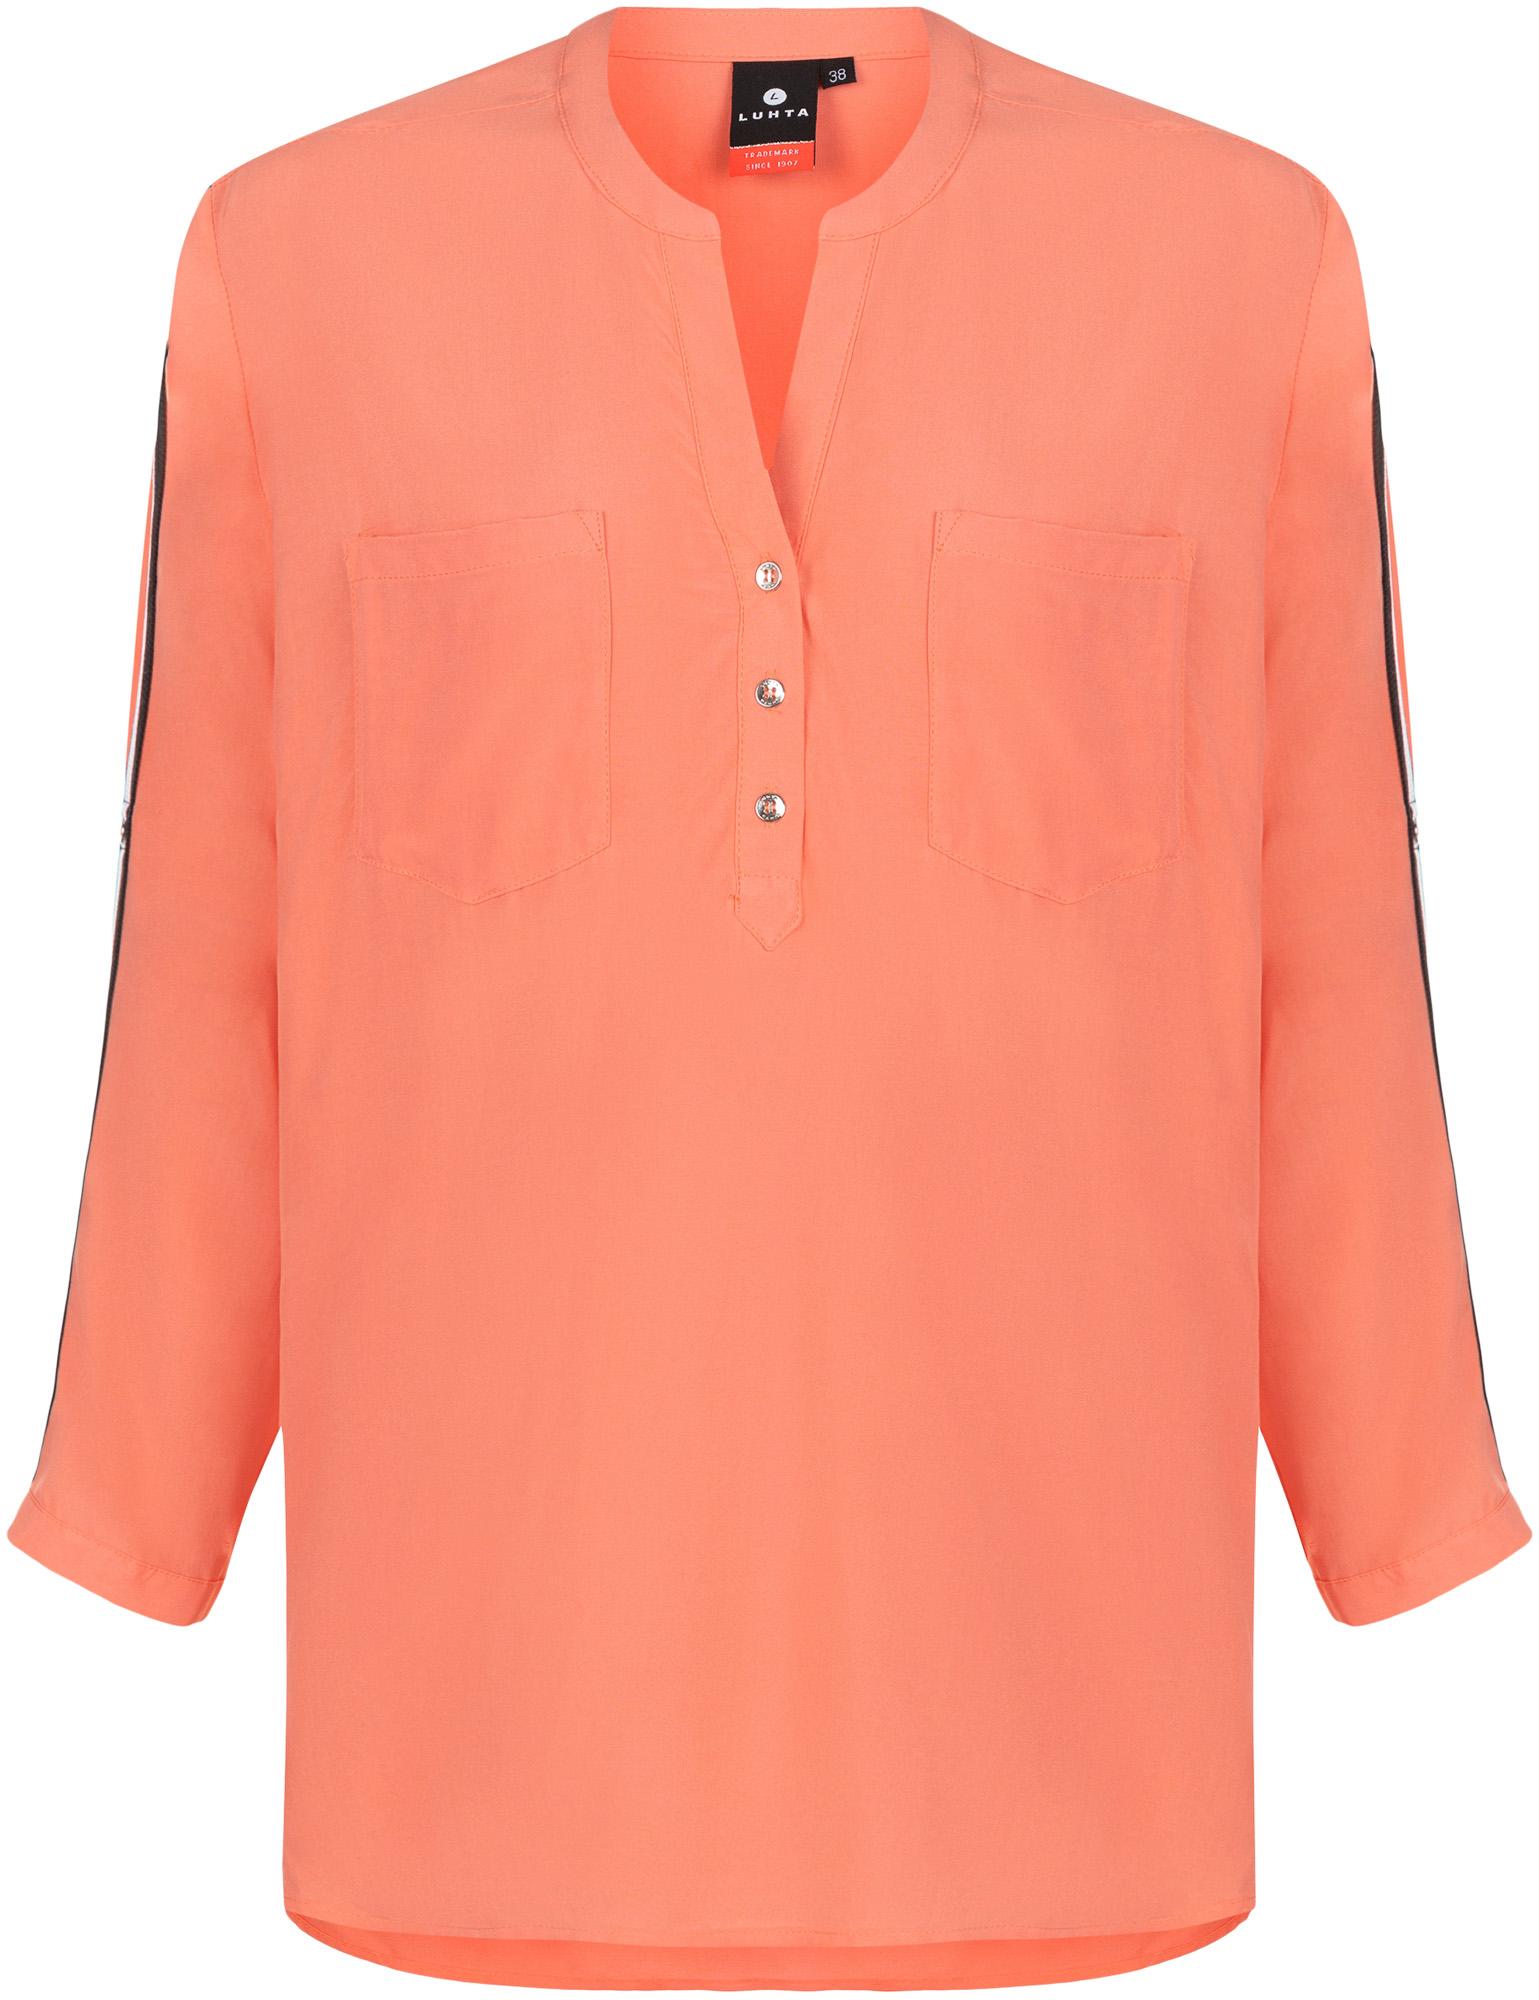 Luhta Рубашка женская Luhta Attala, размер 50 варежки luhta luhta lu692dwadwh0